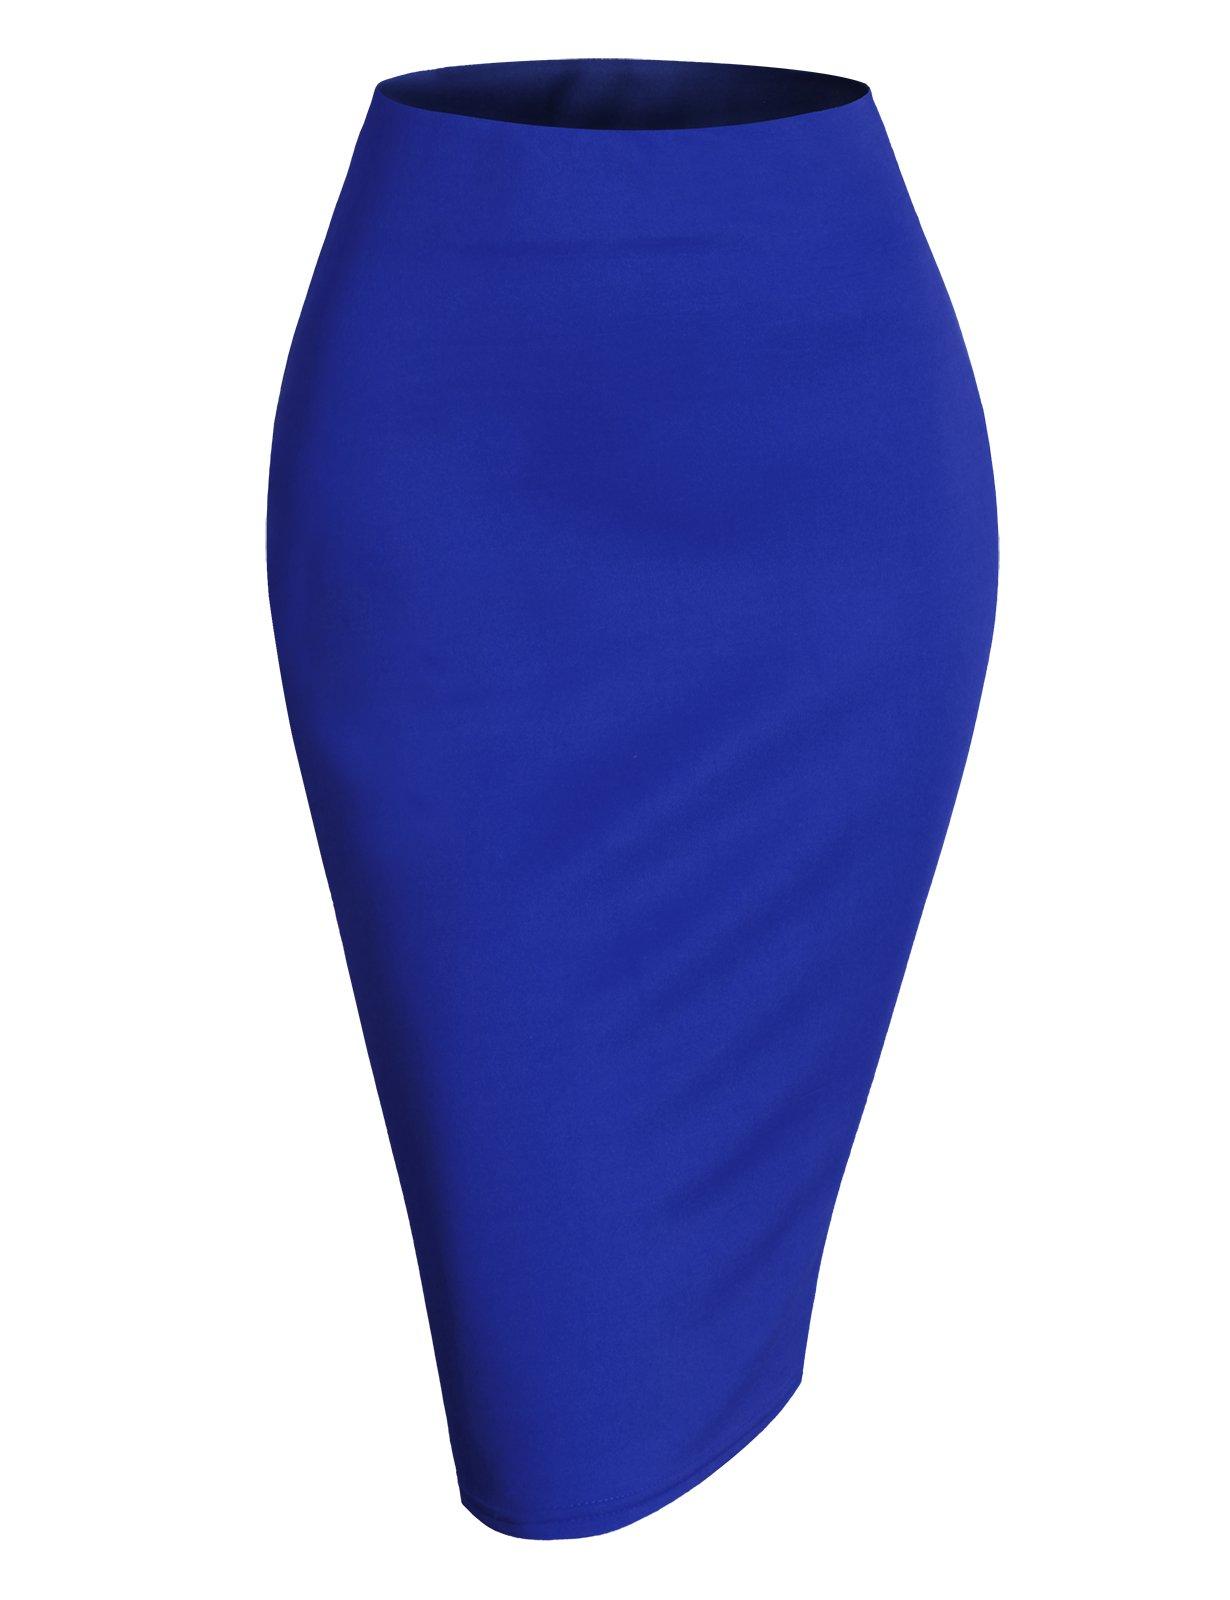 H2H Womens Basic Versatile Elastic Waist Band Office Pencil Skirt RoyalBlue 2XL (AWBMS0188)